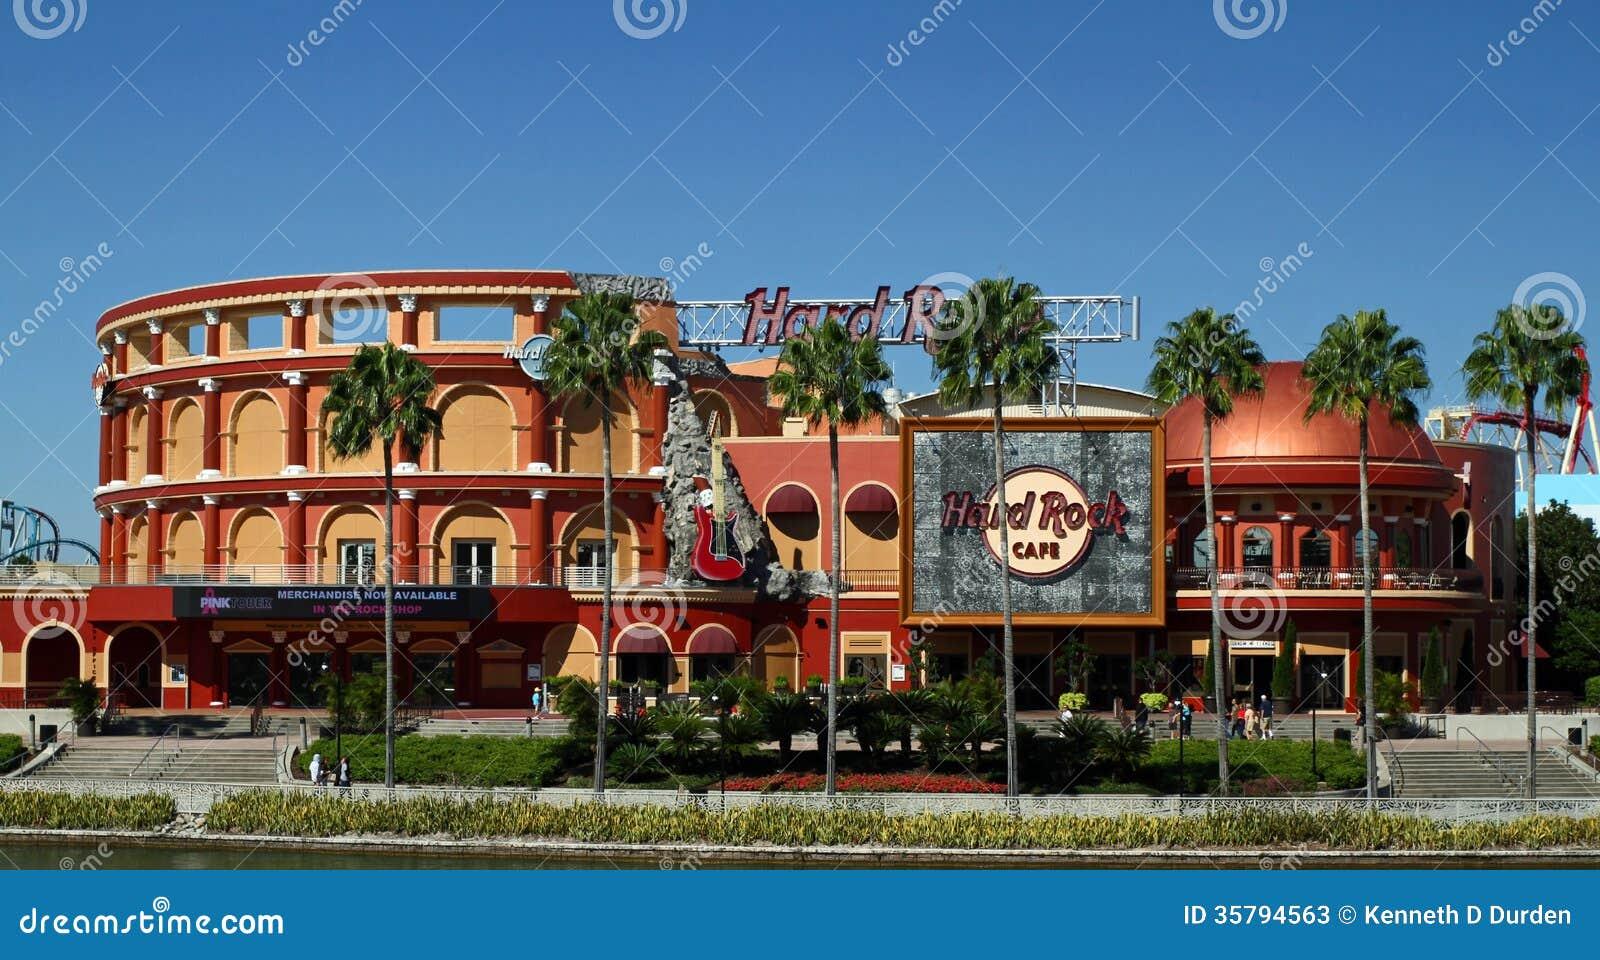 Hard Rock Cafe Resort Orlando Florida